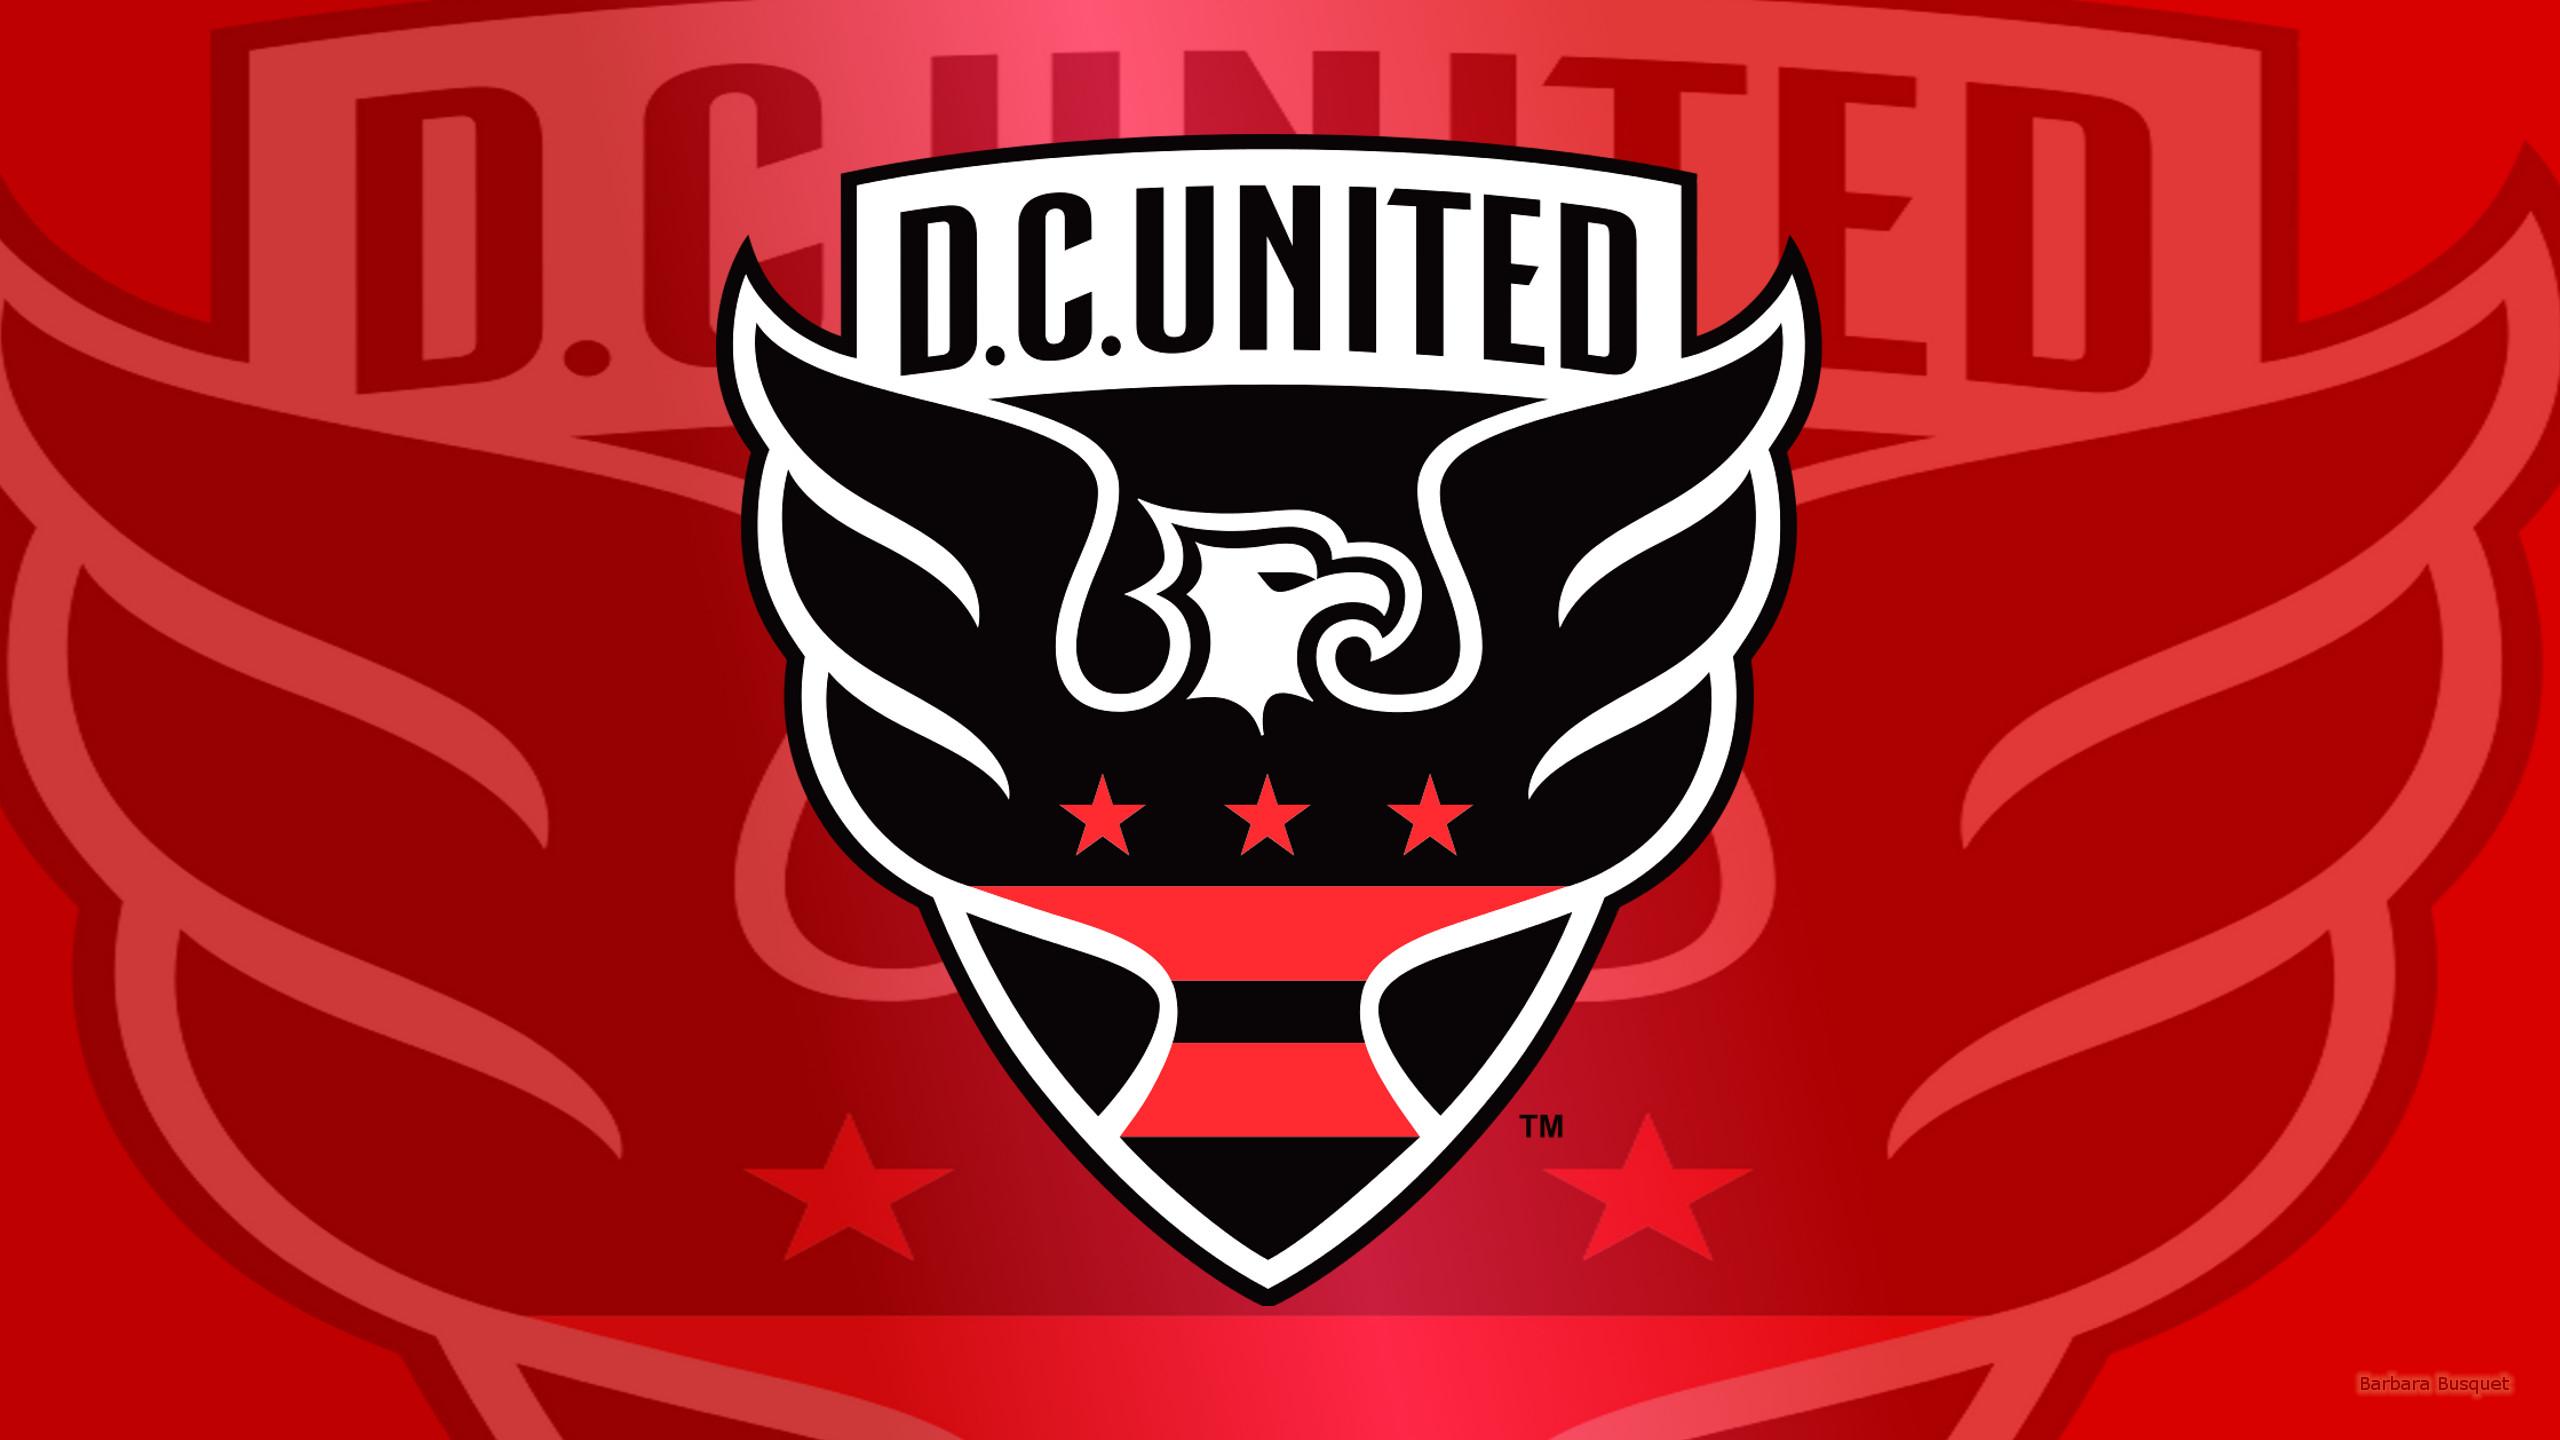 DC United HD Wallpaper Background Image 2560x1440 ID 2560x1440